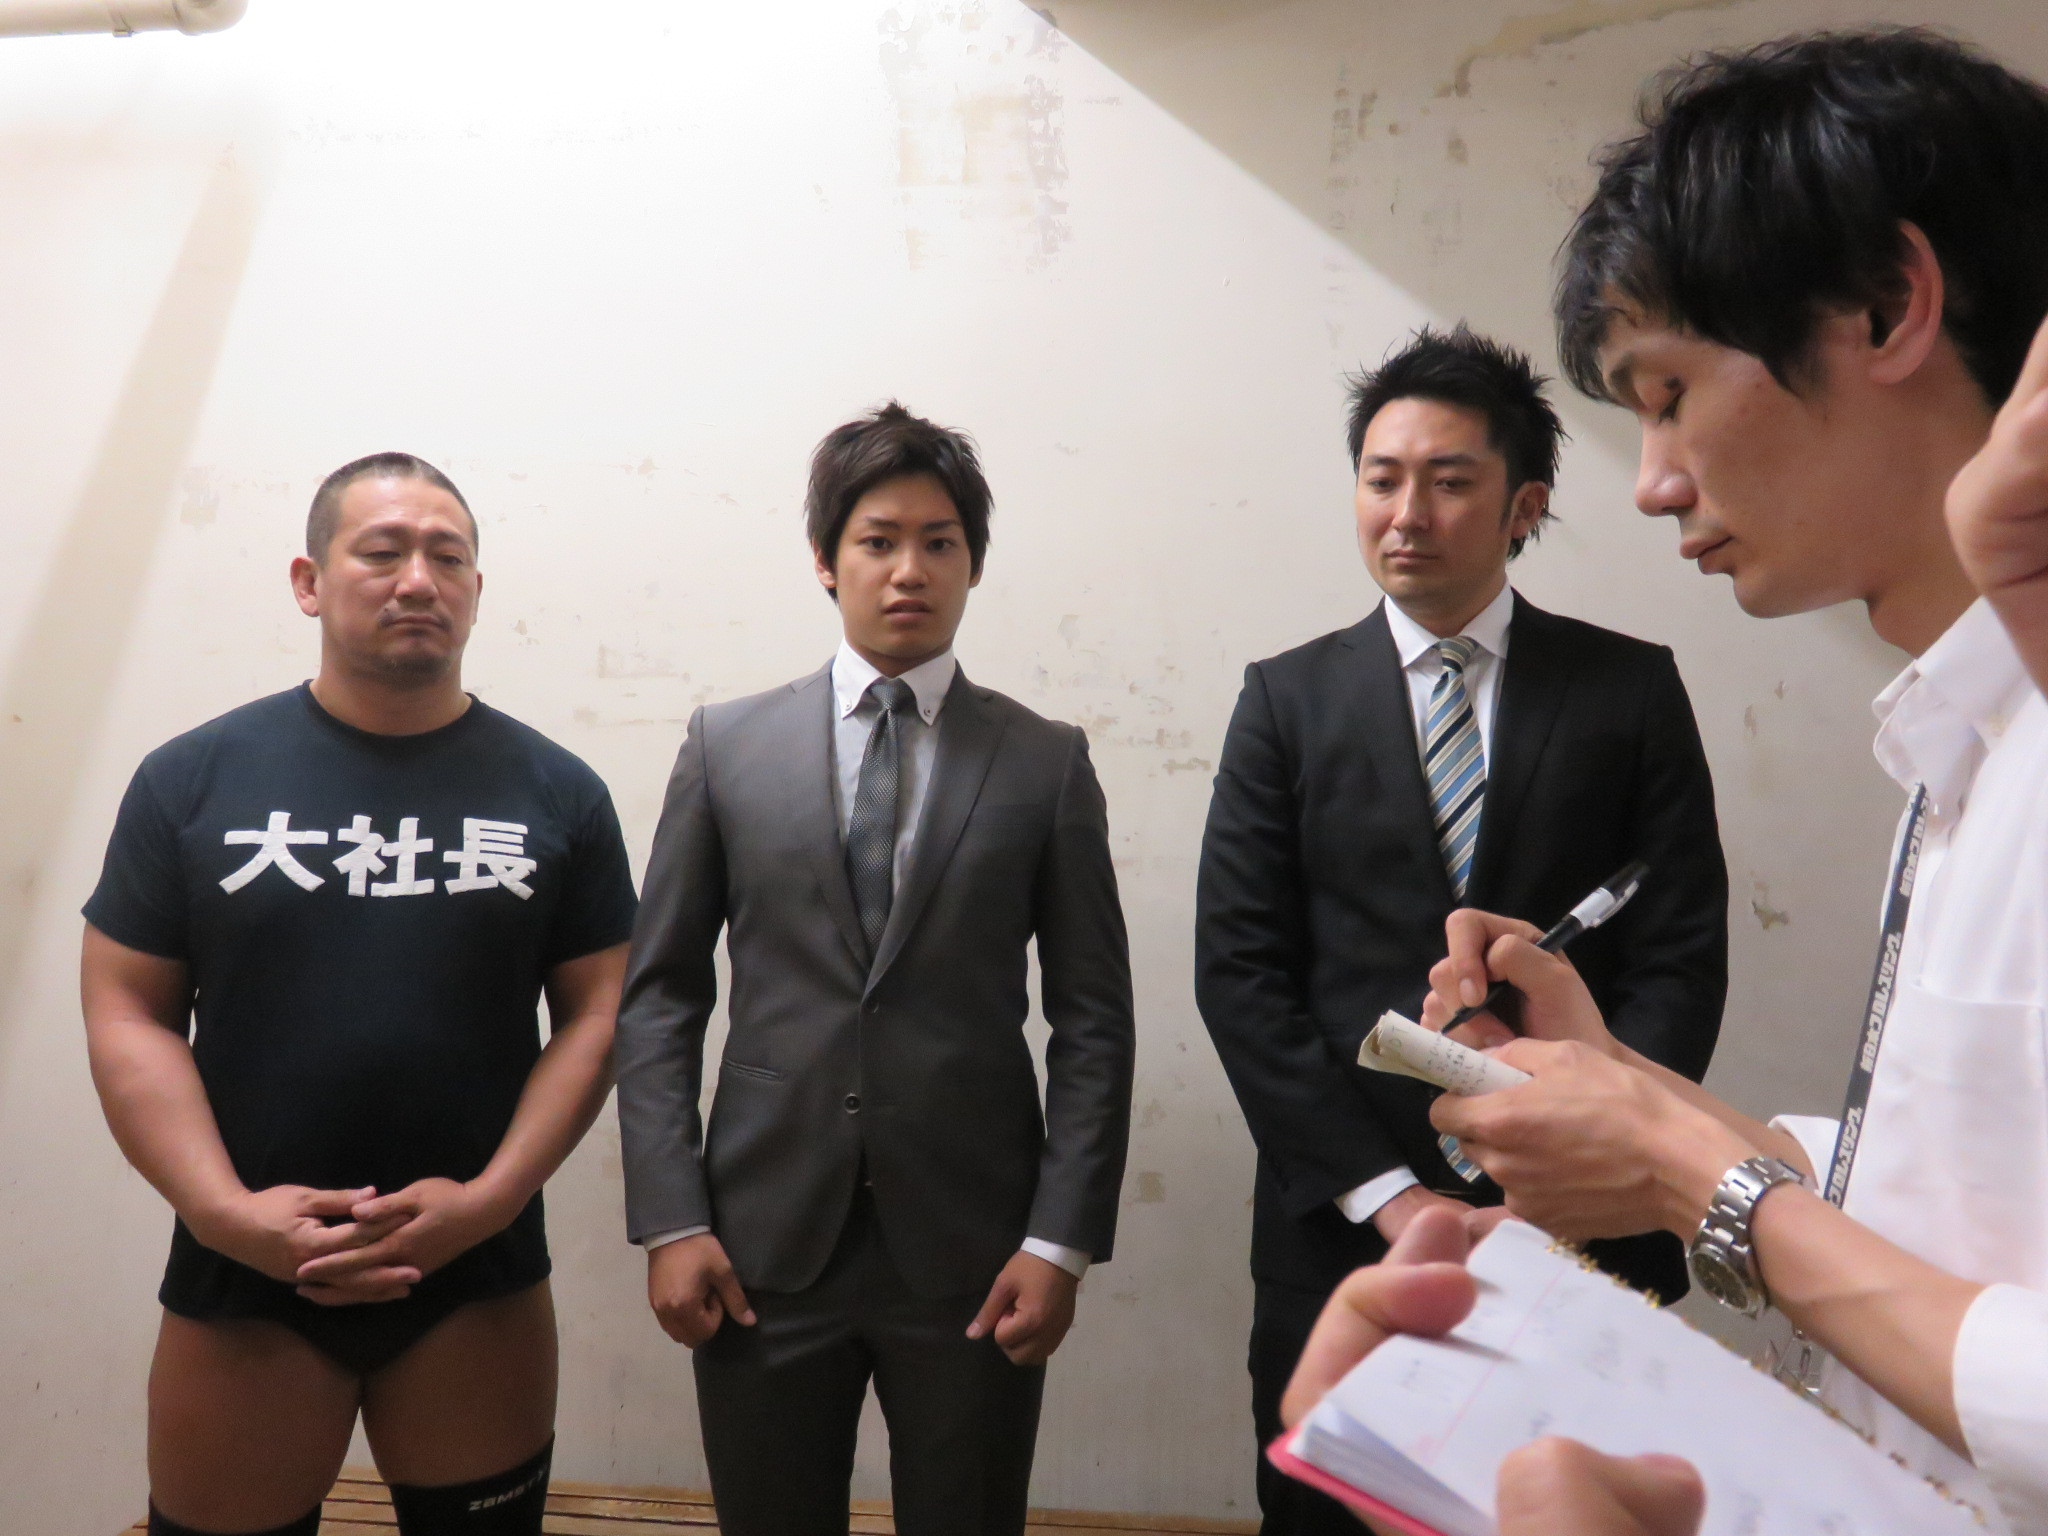 http://news.yoshimoto.co.jp/photos/uncategorized/2015/05/31/20150531173505-c1e3ff0a785df27636385c2d08b70c1336ff975f.jpg